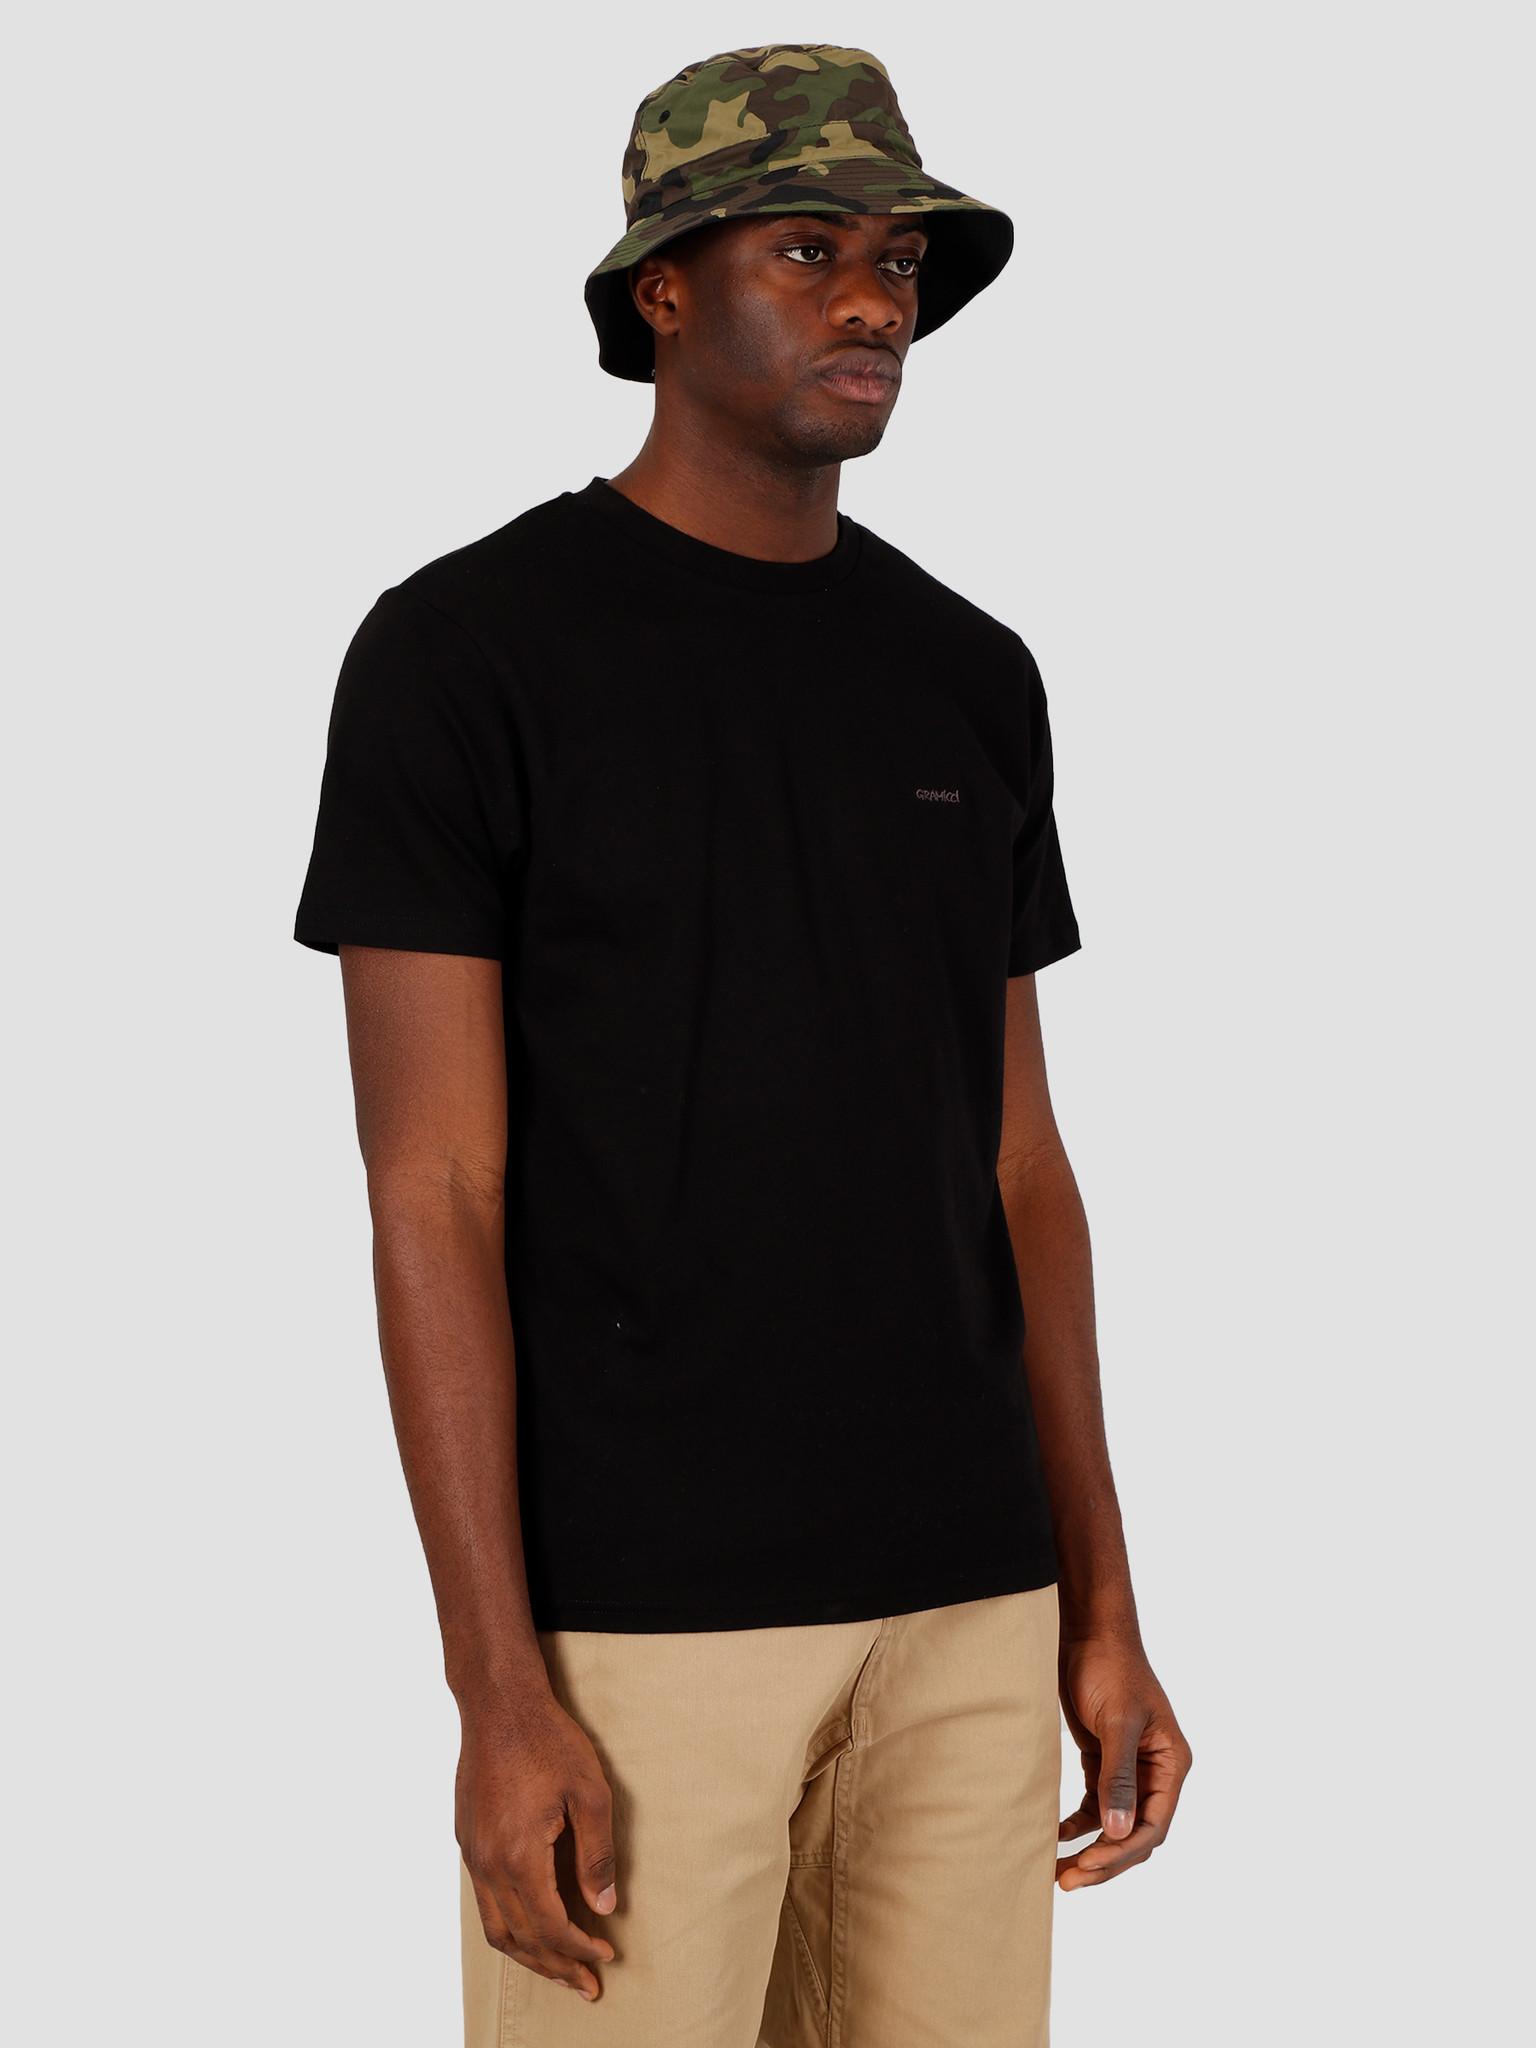 Gramicci Gramicci G T-Shirt Black GUT-20S064